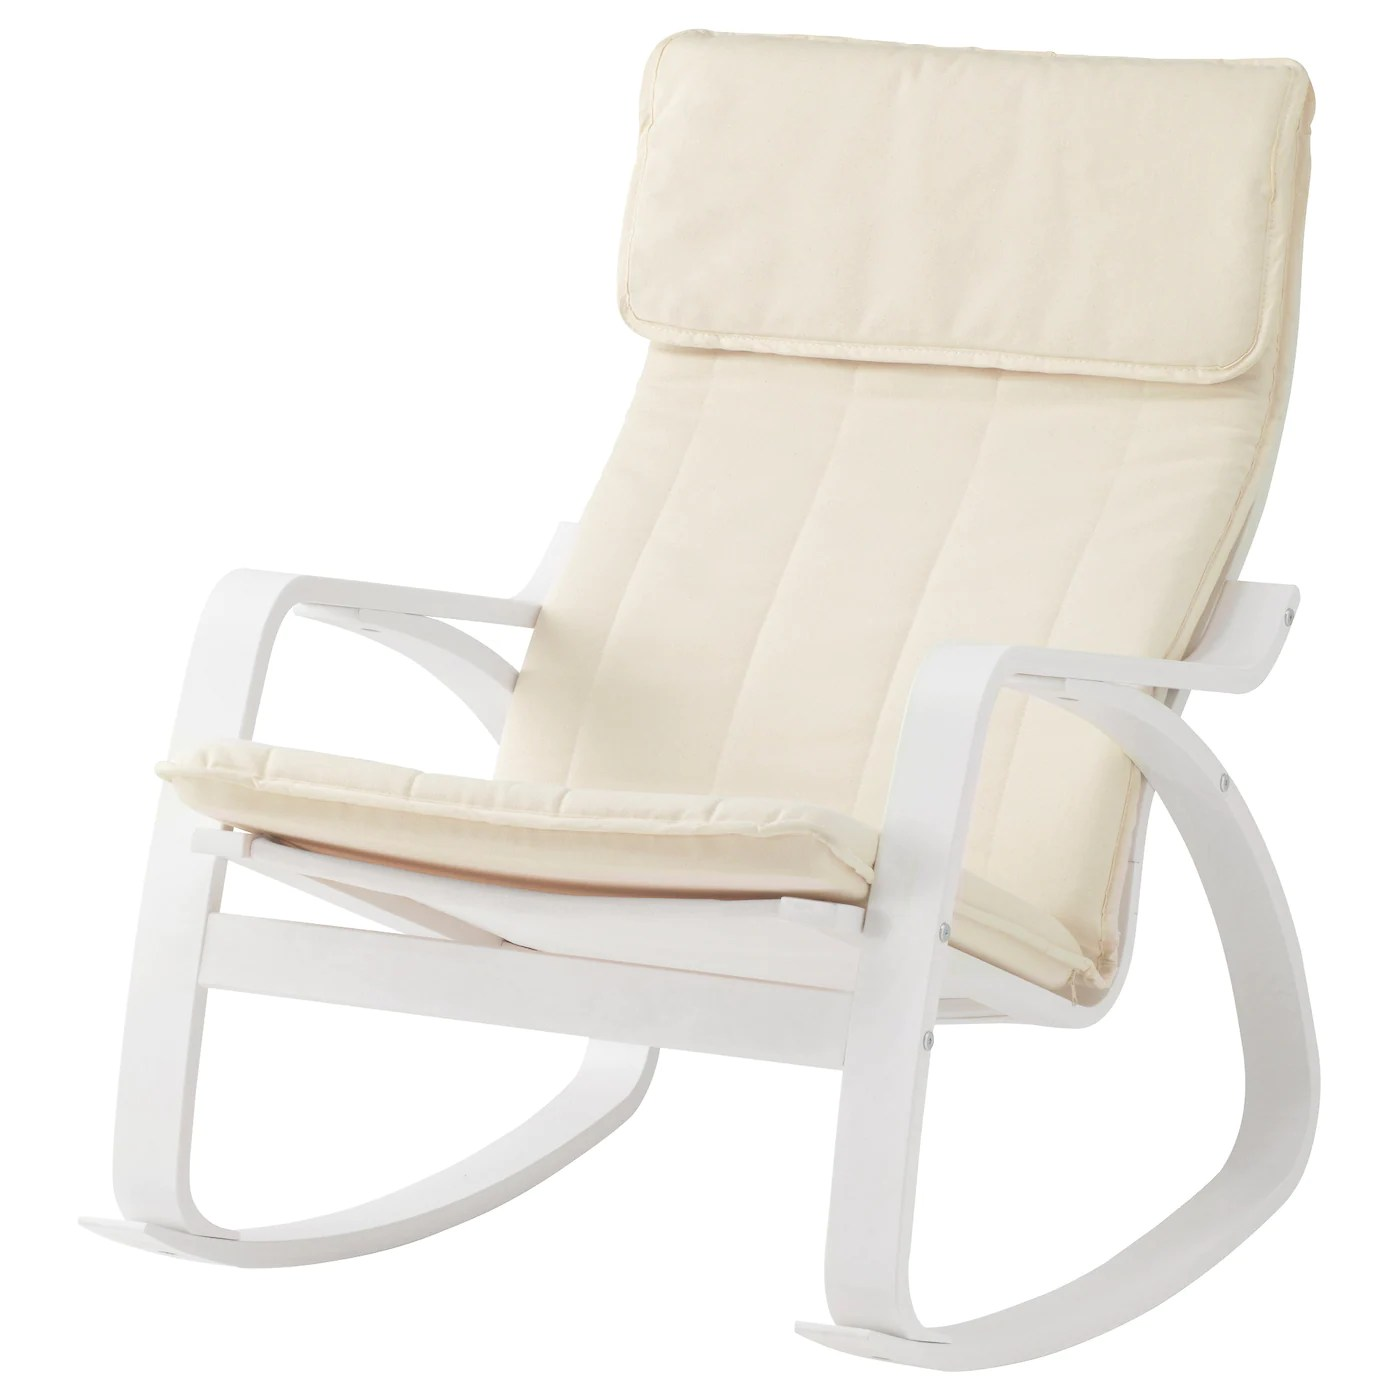 ikea white rocking chair antique styles poÄng ransta natural